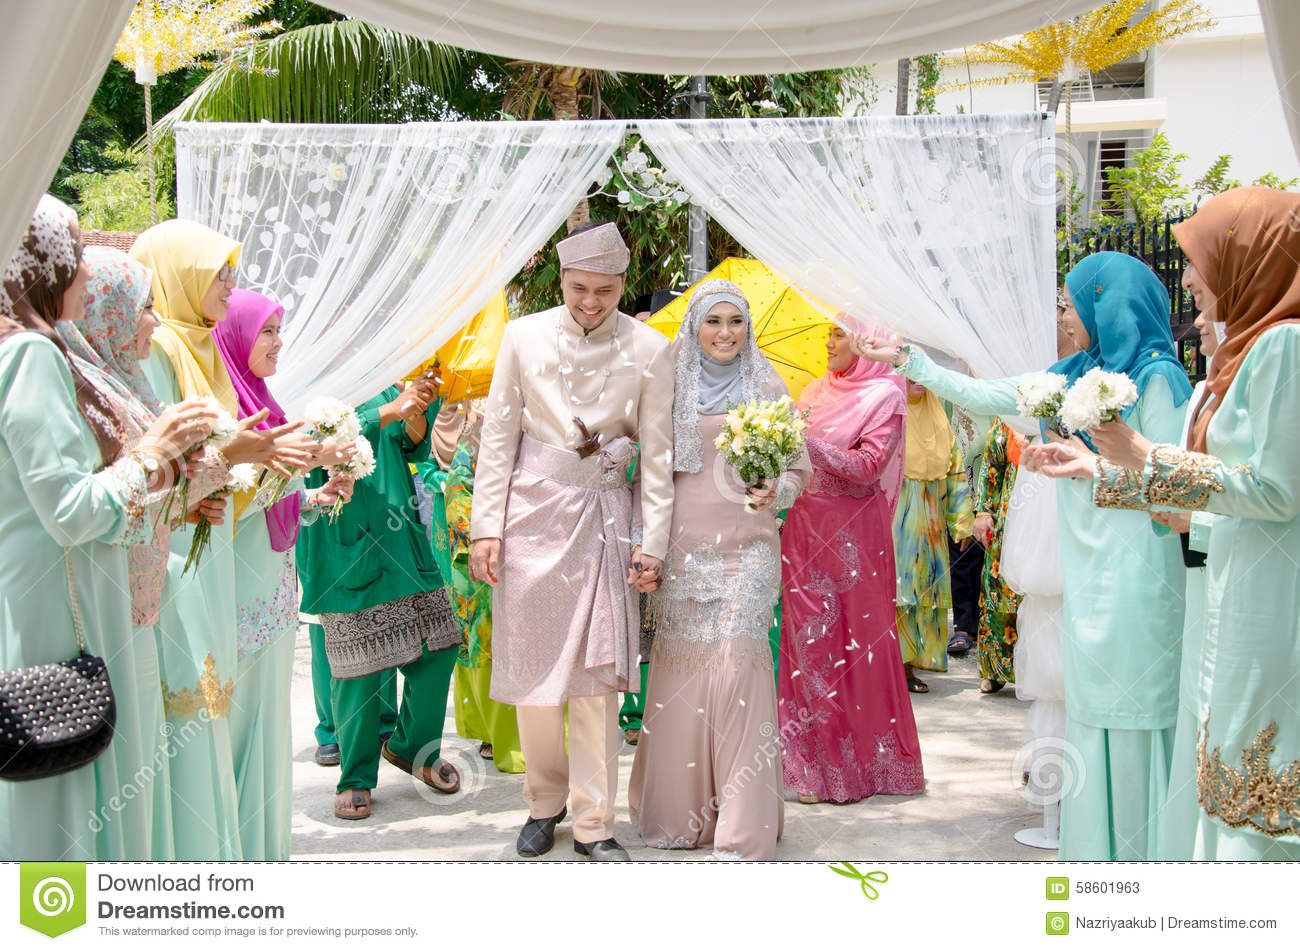 Kuala Lumpur Malaysia March 22 2014 Malay Wedding A Malaysian Couple Newly Wed Holding Hands And Walking Is Being Co Malay Wedding Wedding Wedding Events